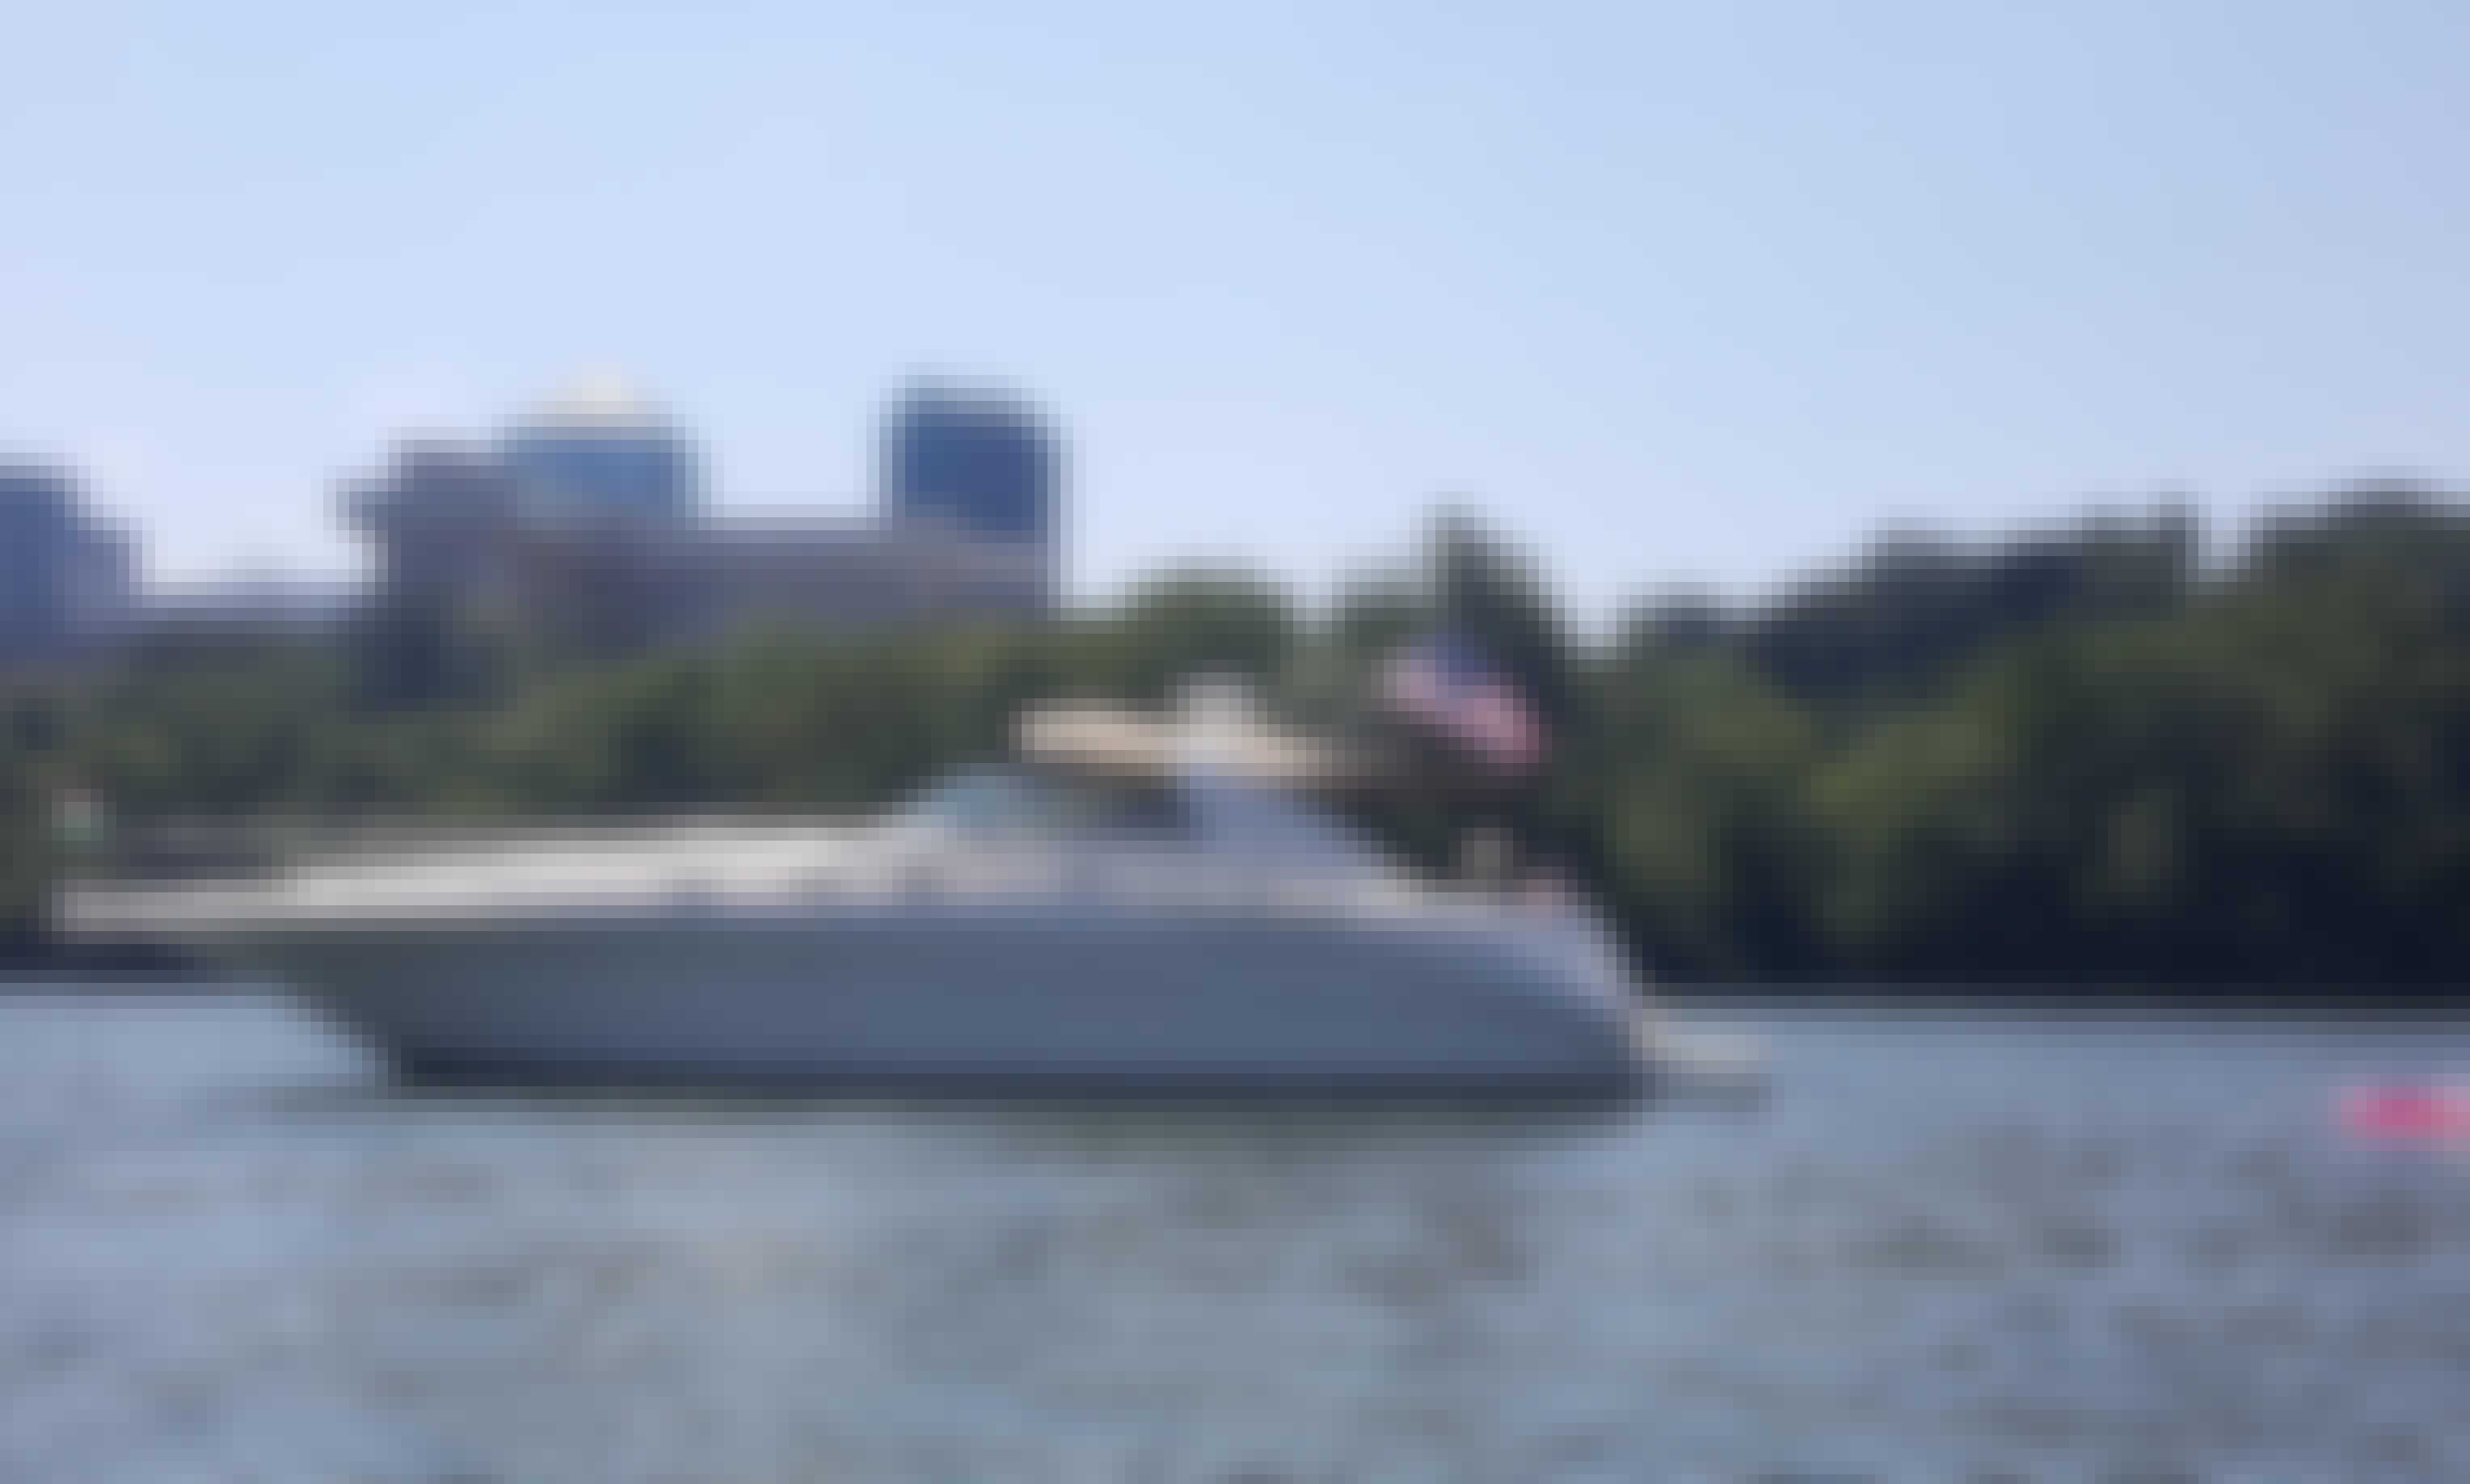 45' Motor Yacht Washington DC - 6 people max per USCG Laws